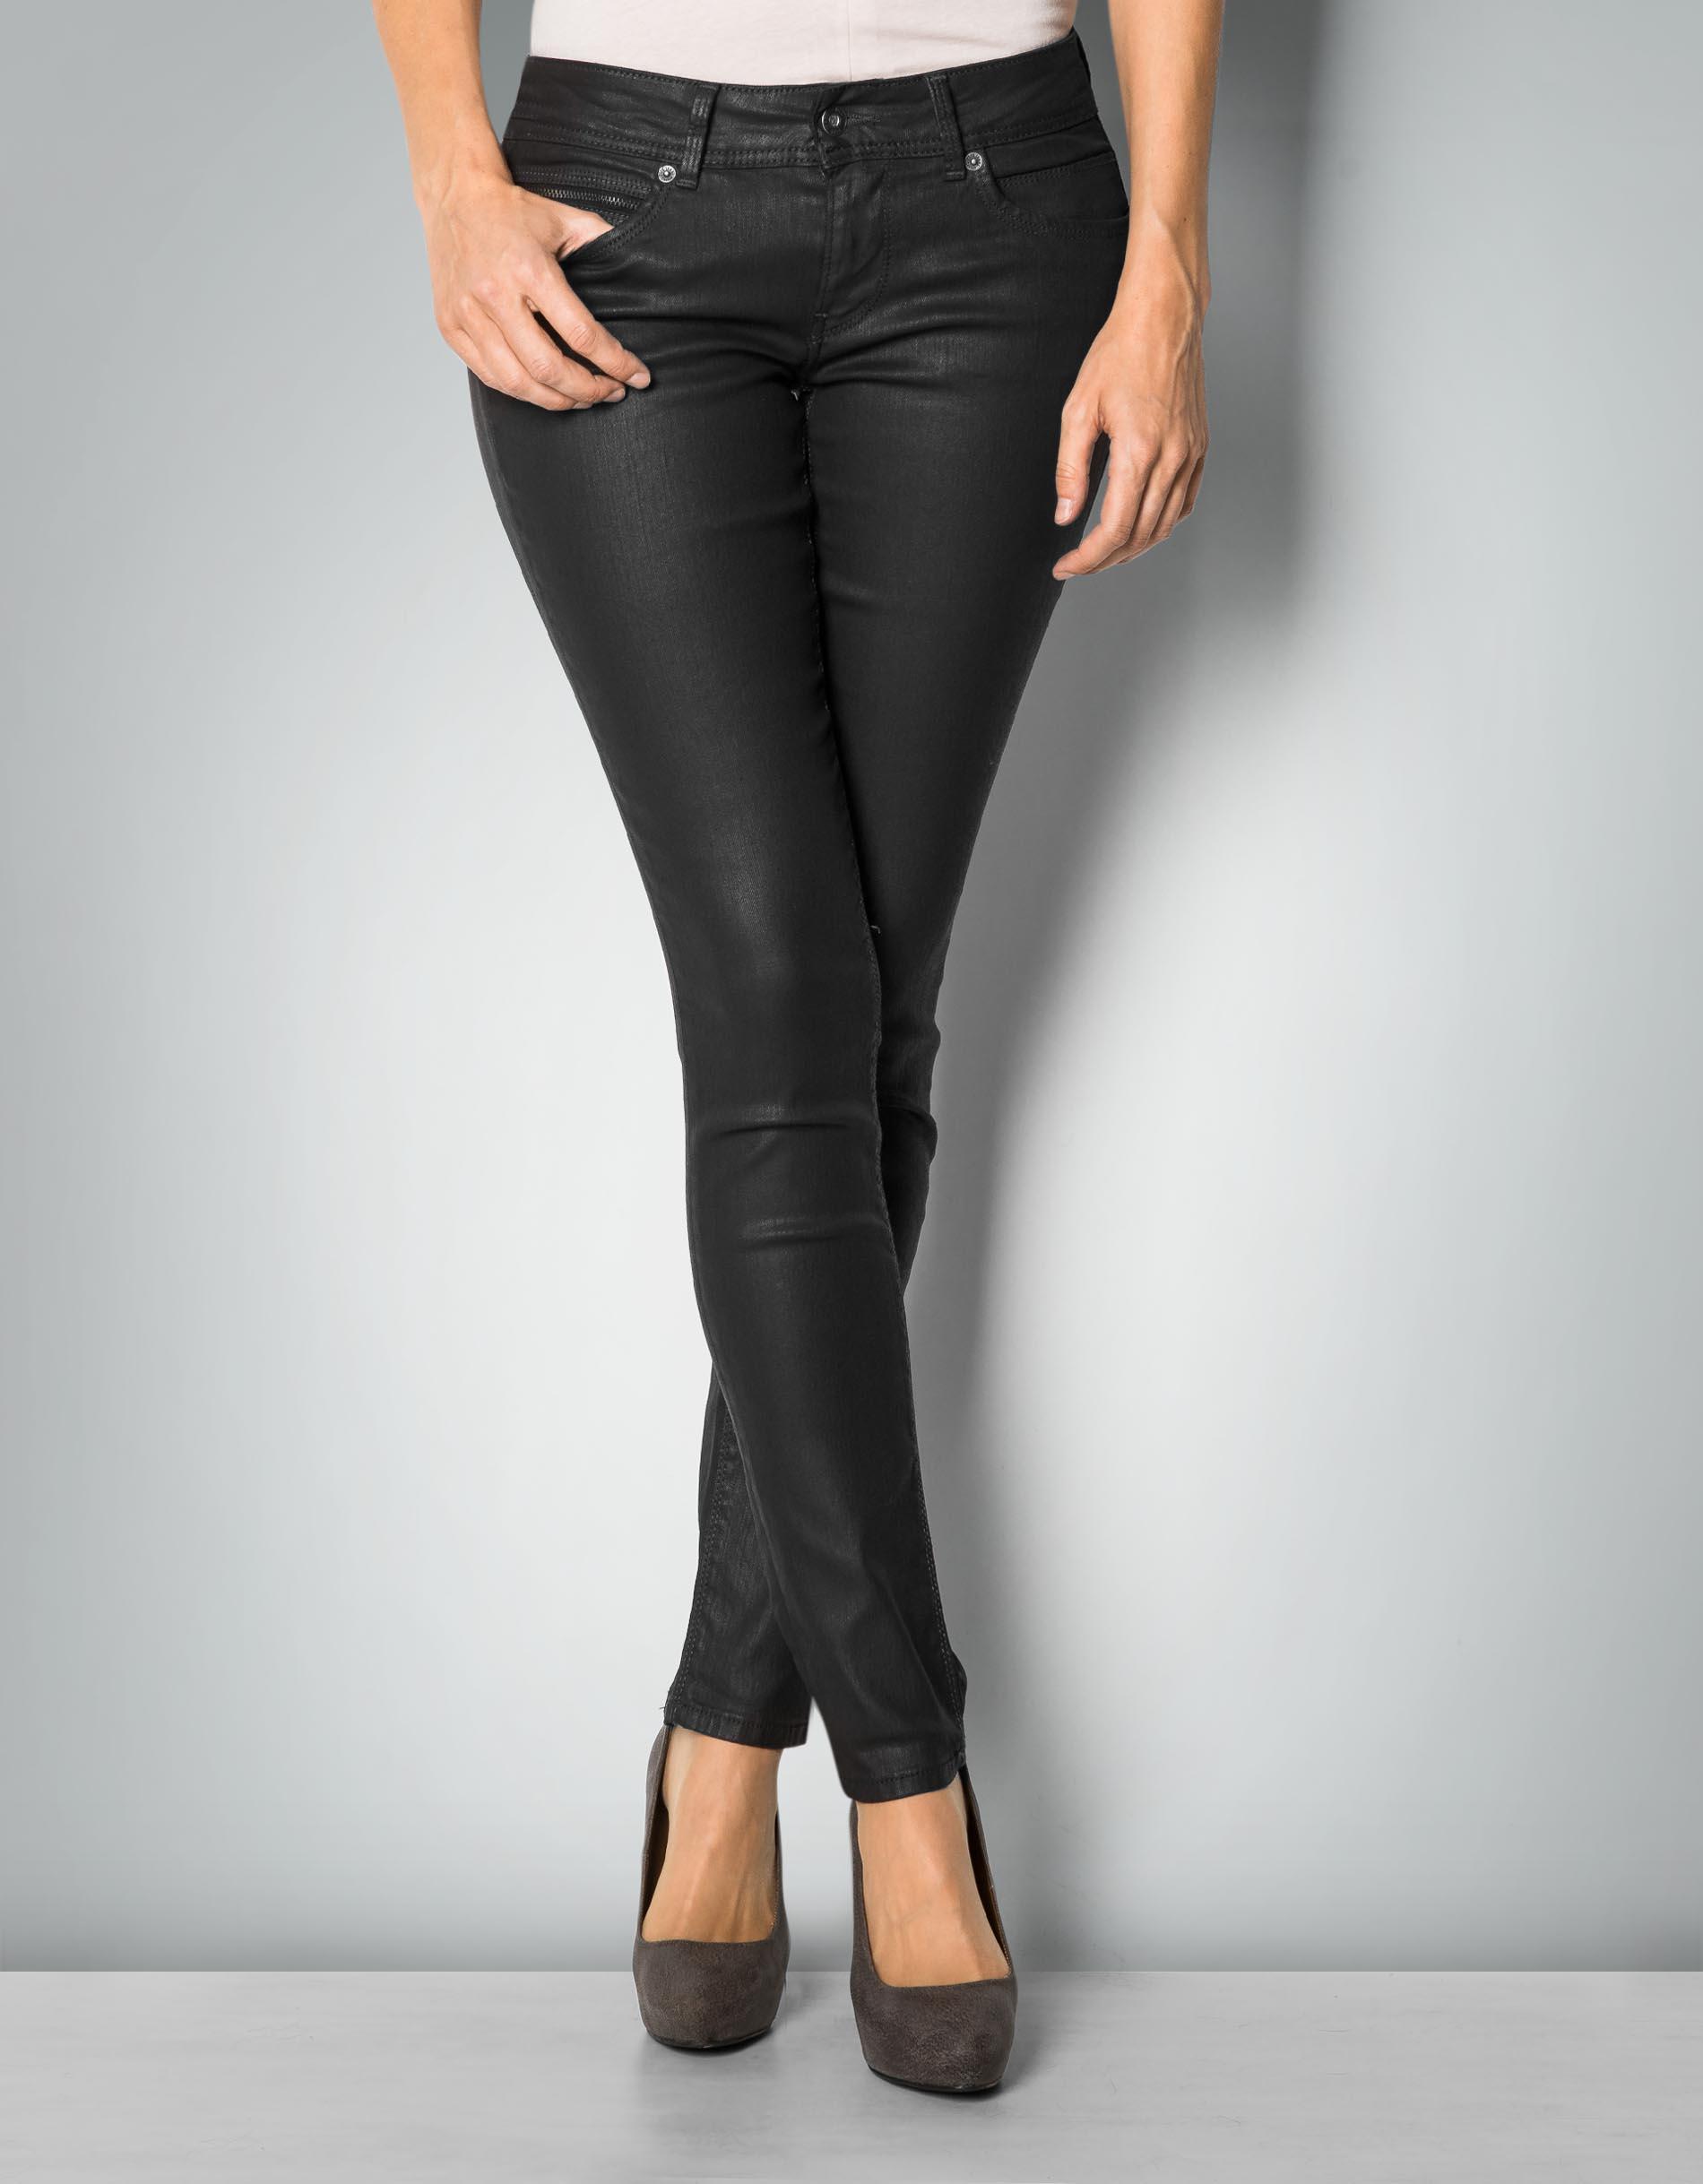 online store 77f5f a1c72 Pepe Jeans Damen Jeans New Brooke - Slim Fit - Schwarz - Black